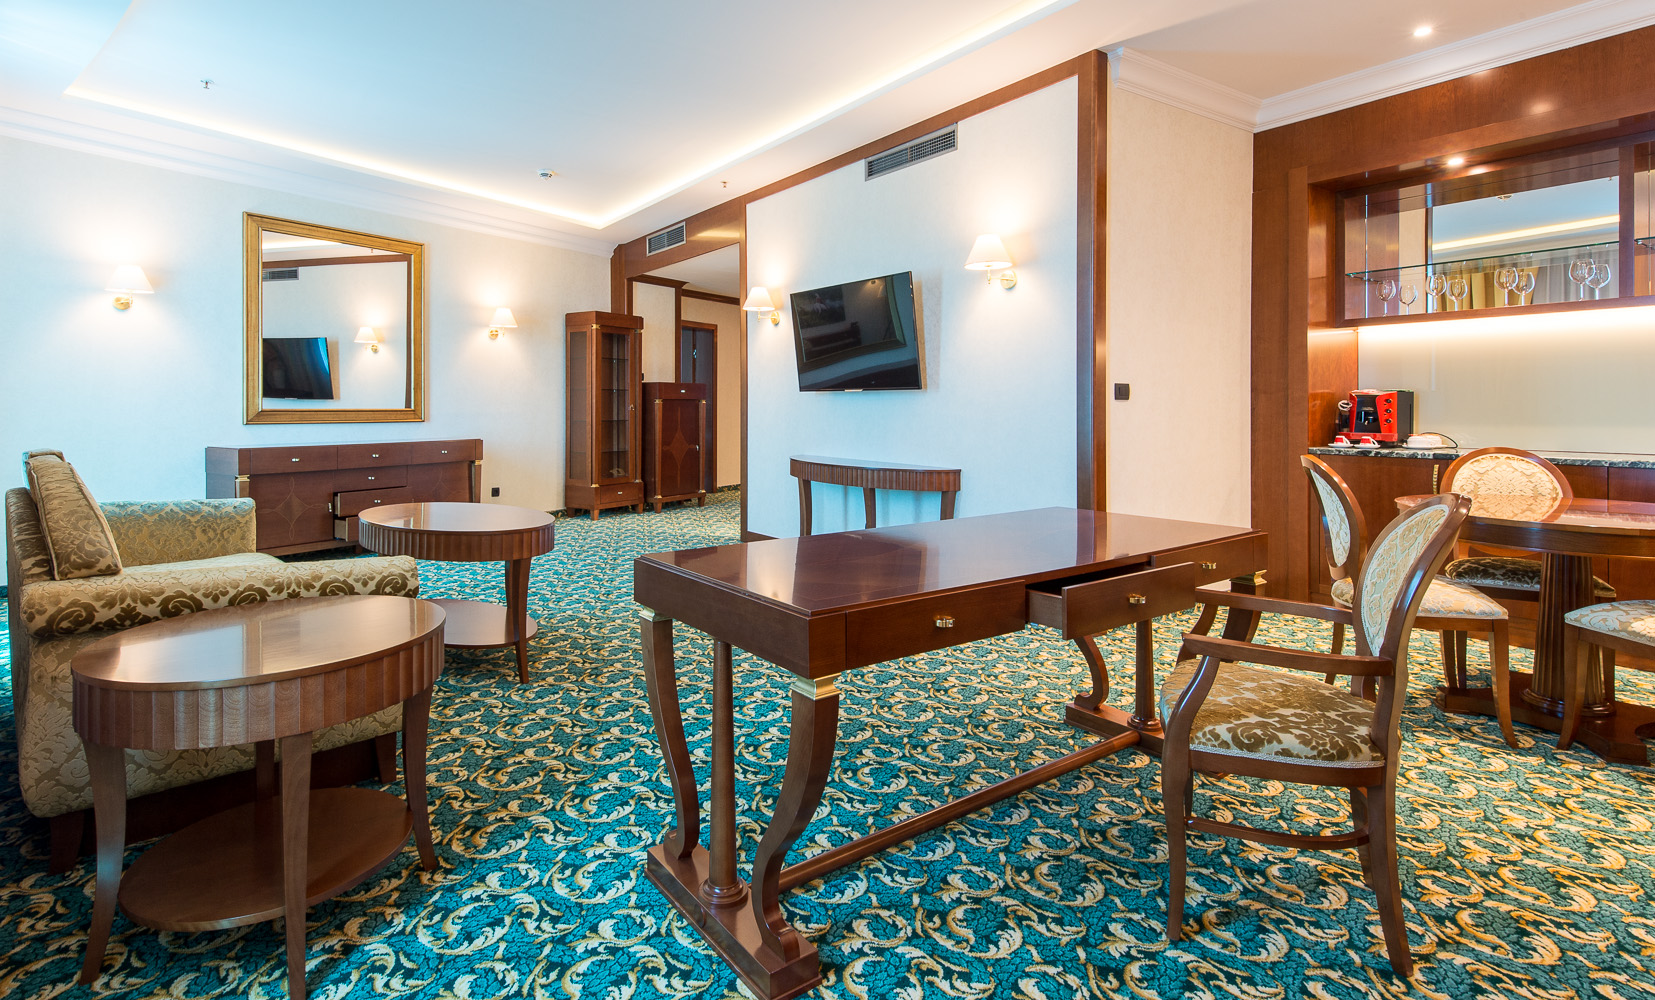 hotel-Mellain-Tuzla_oprema-javnega-dela_hotelske-sobe_oprema-hotela_hotel-furniture_lobby_restaurant_classic-furniture_12